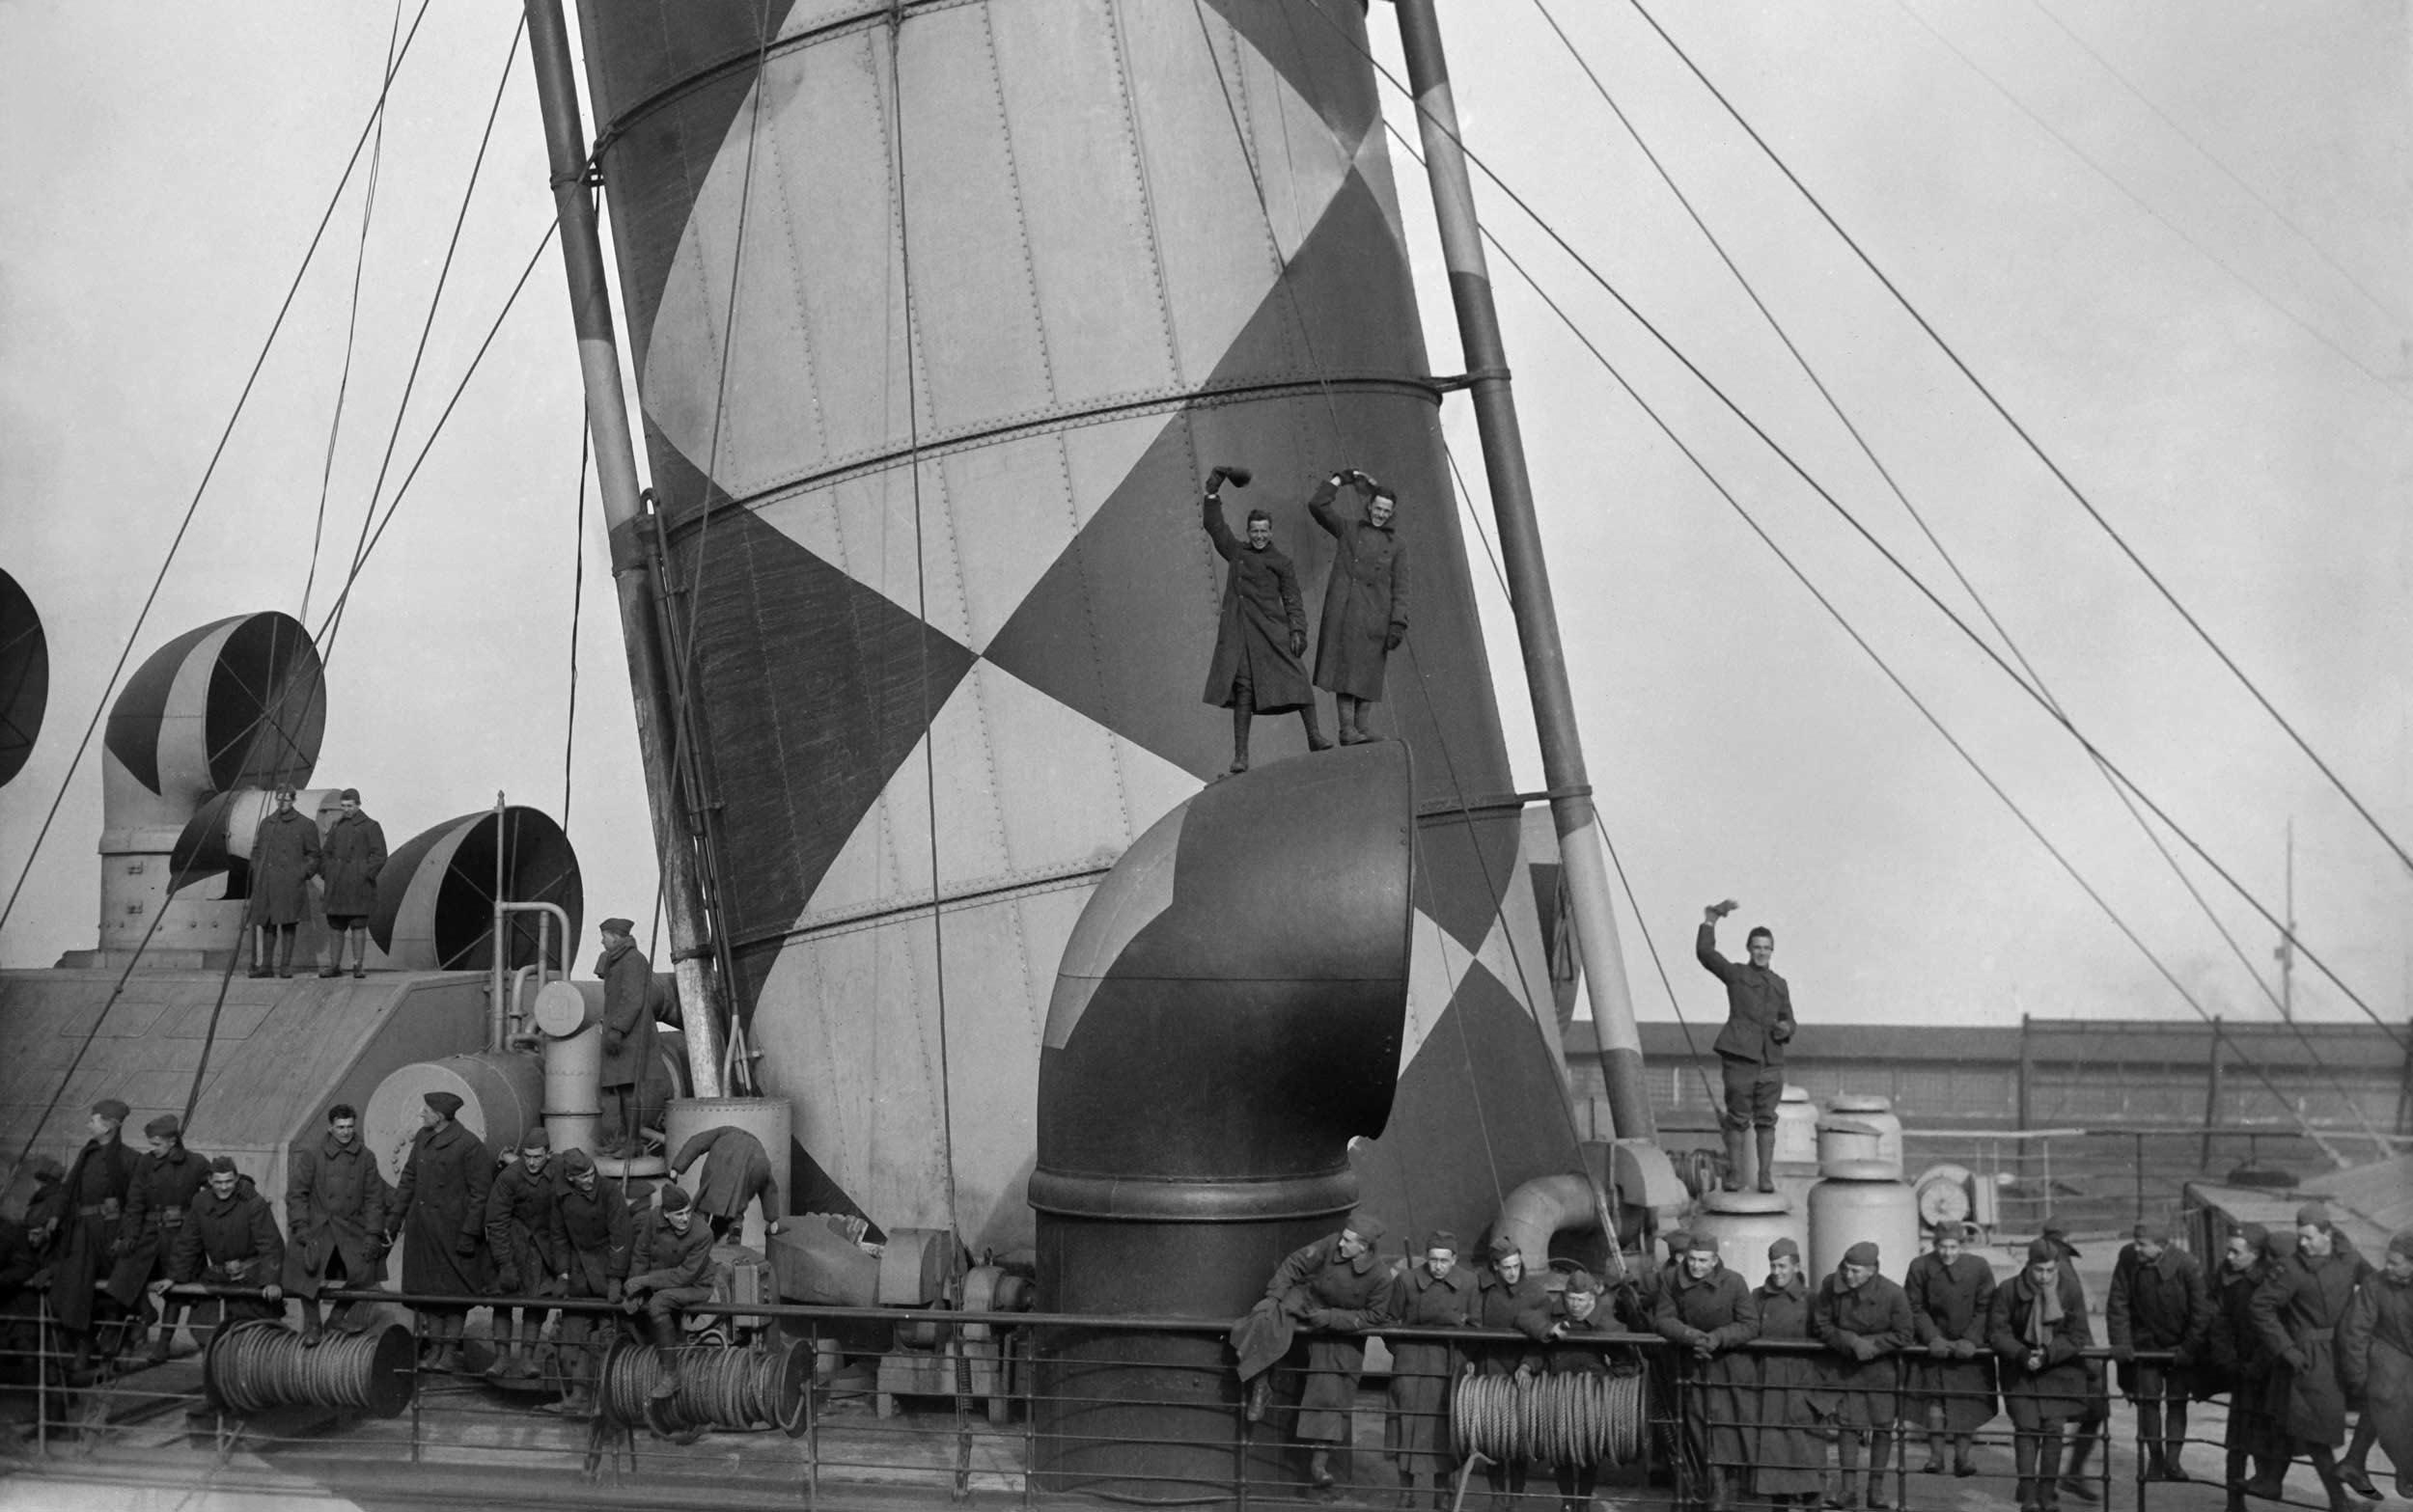 dazzle-ship-mauretania-5.jpg